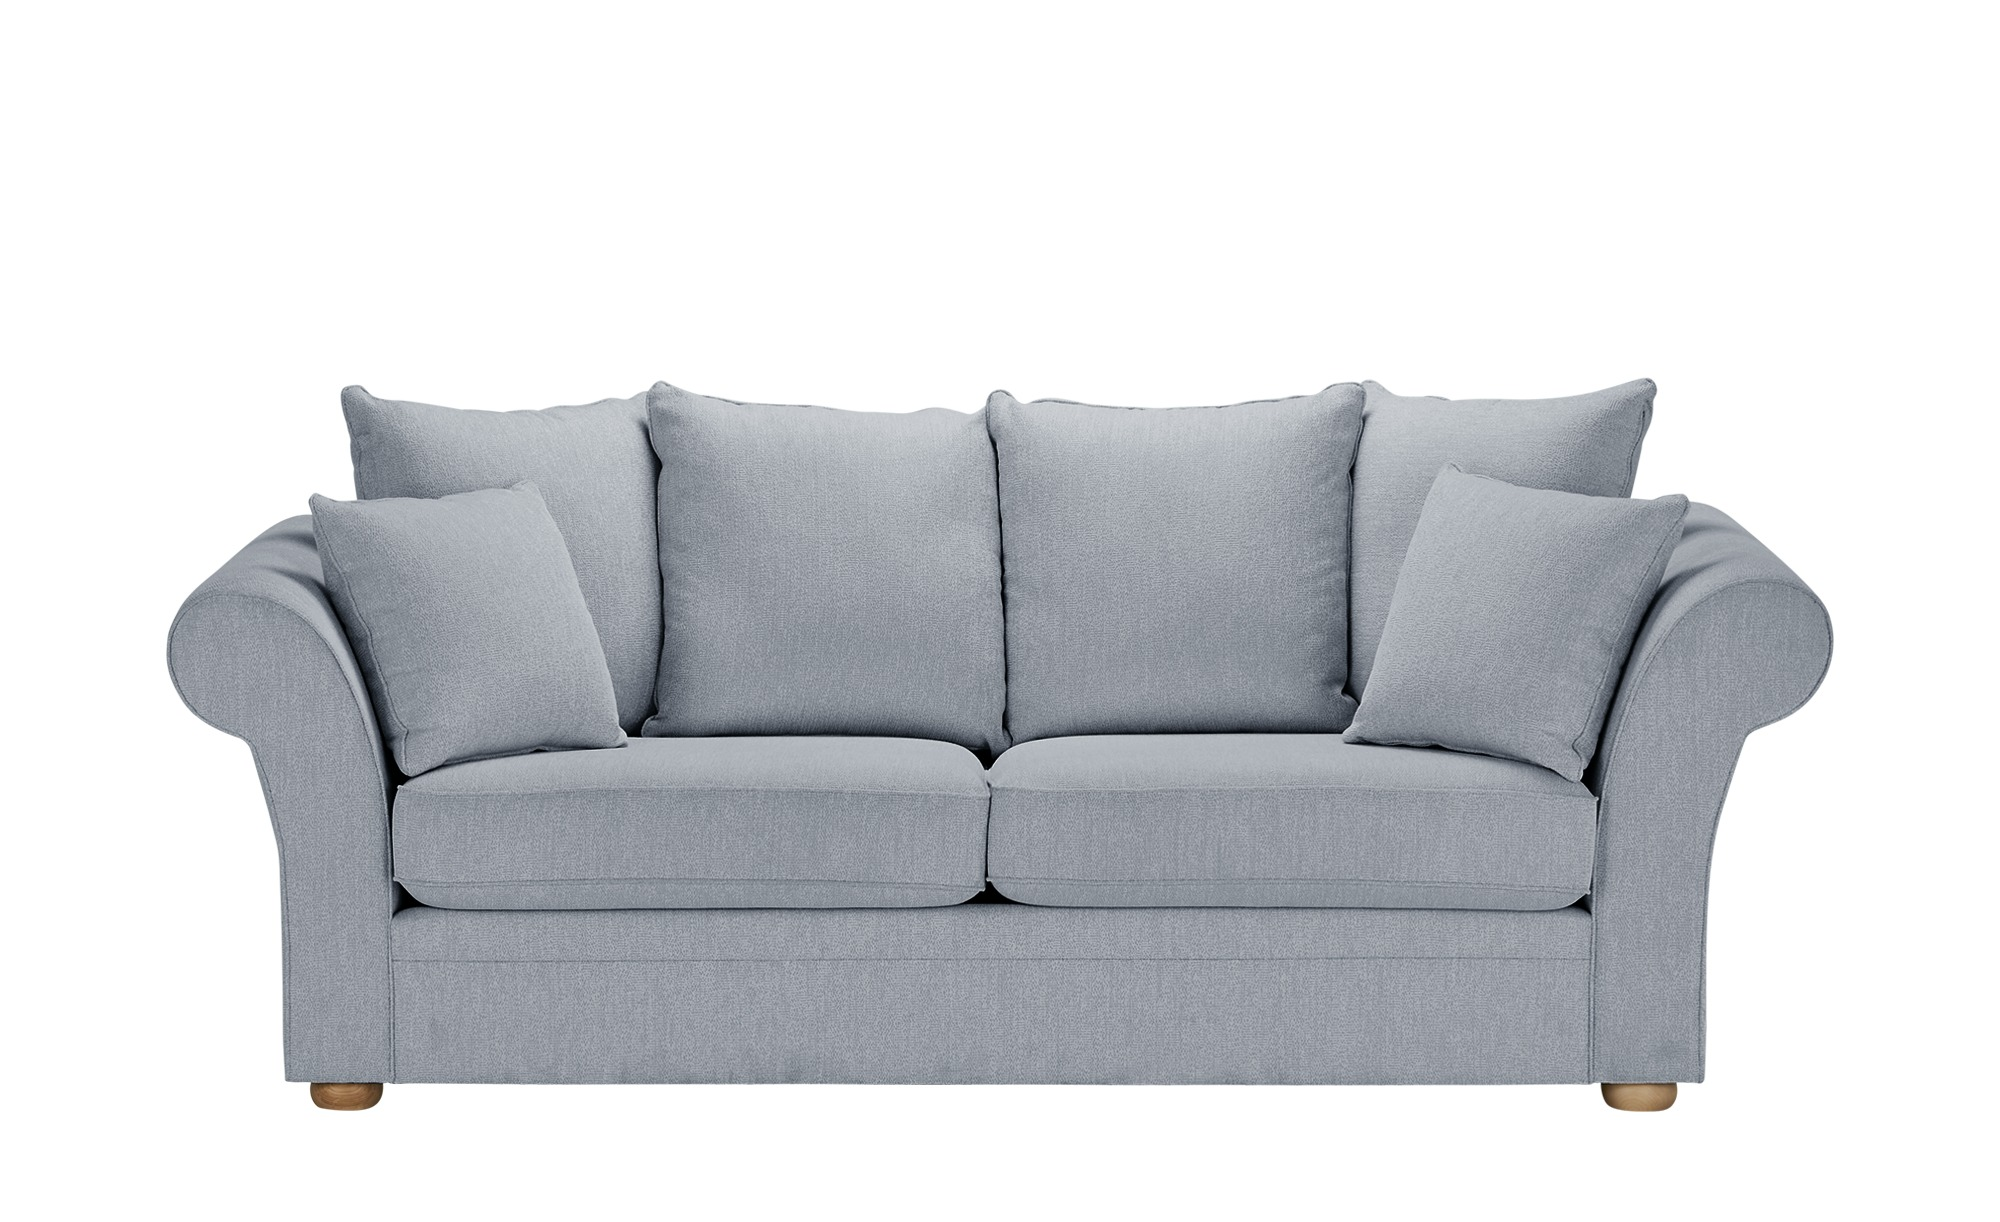 Sofa  Olivia ¦ blau ¦ Maße (cm): B: 240 H: 100 T: 98 Polstermöbel > Sofas > 3-Sitzer - Höffner